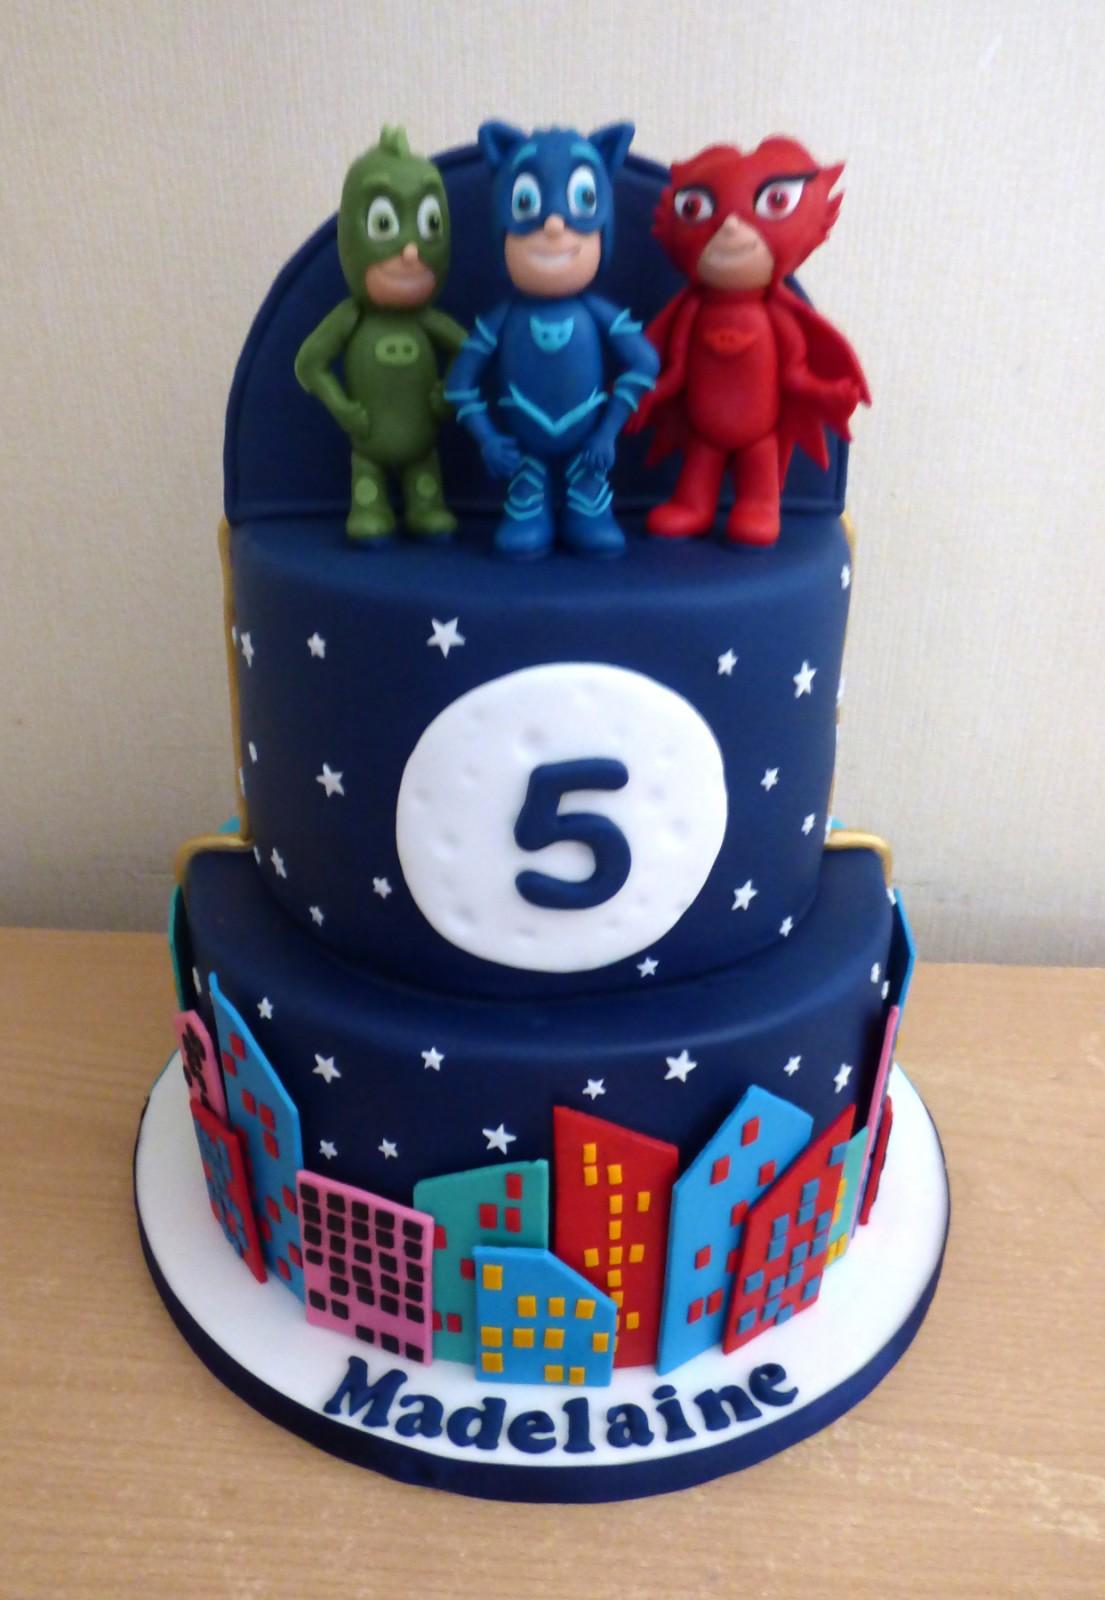 Admirable 2 Tier Half And Half Aladdin And Pj Masks Birthday Cake Susies Personalised Birthday Cards Arneslily Jamesorg